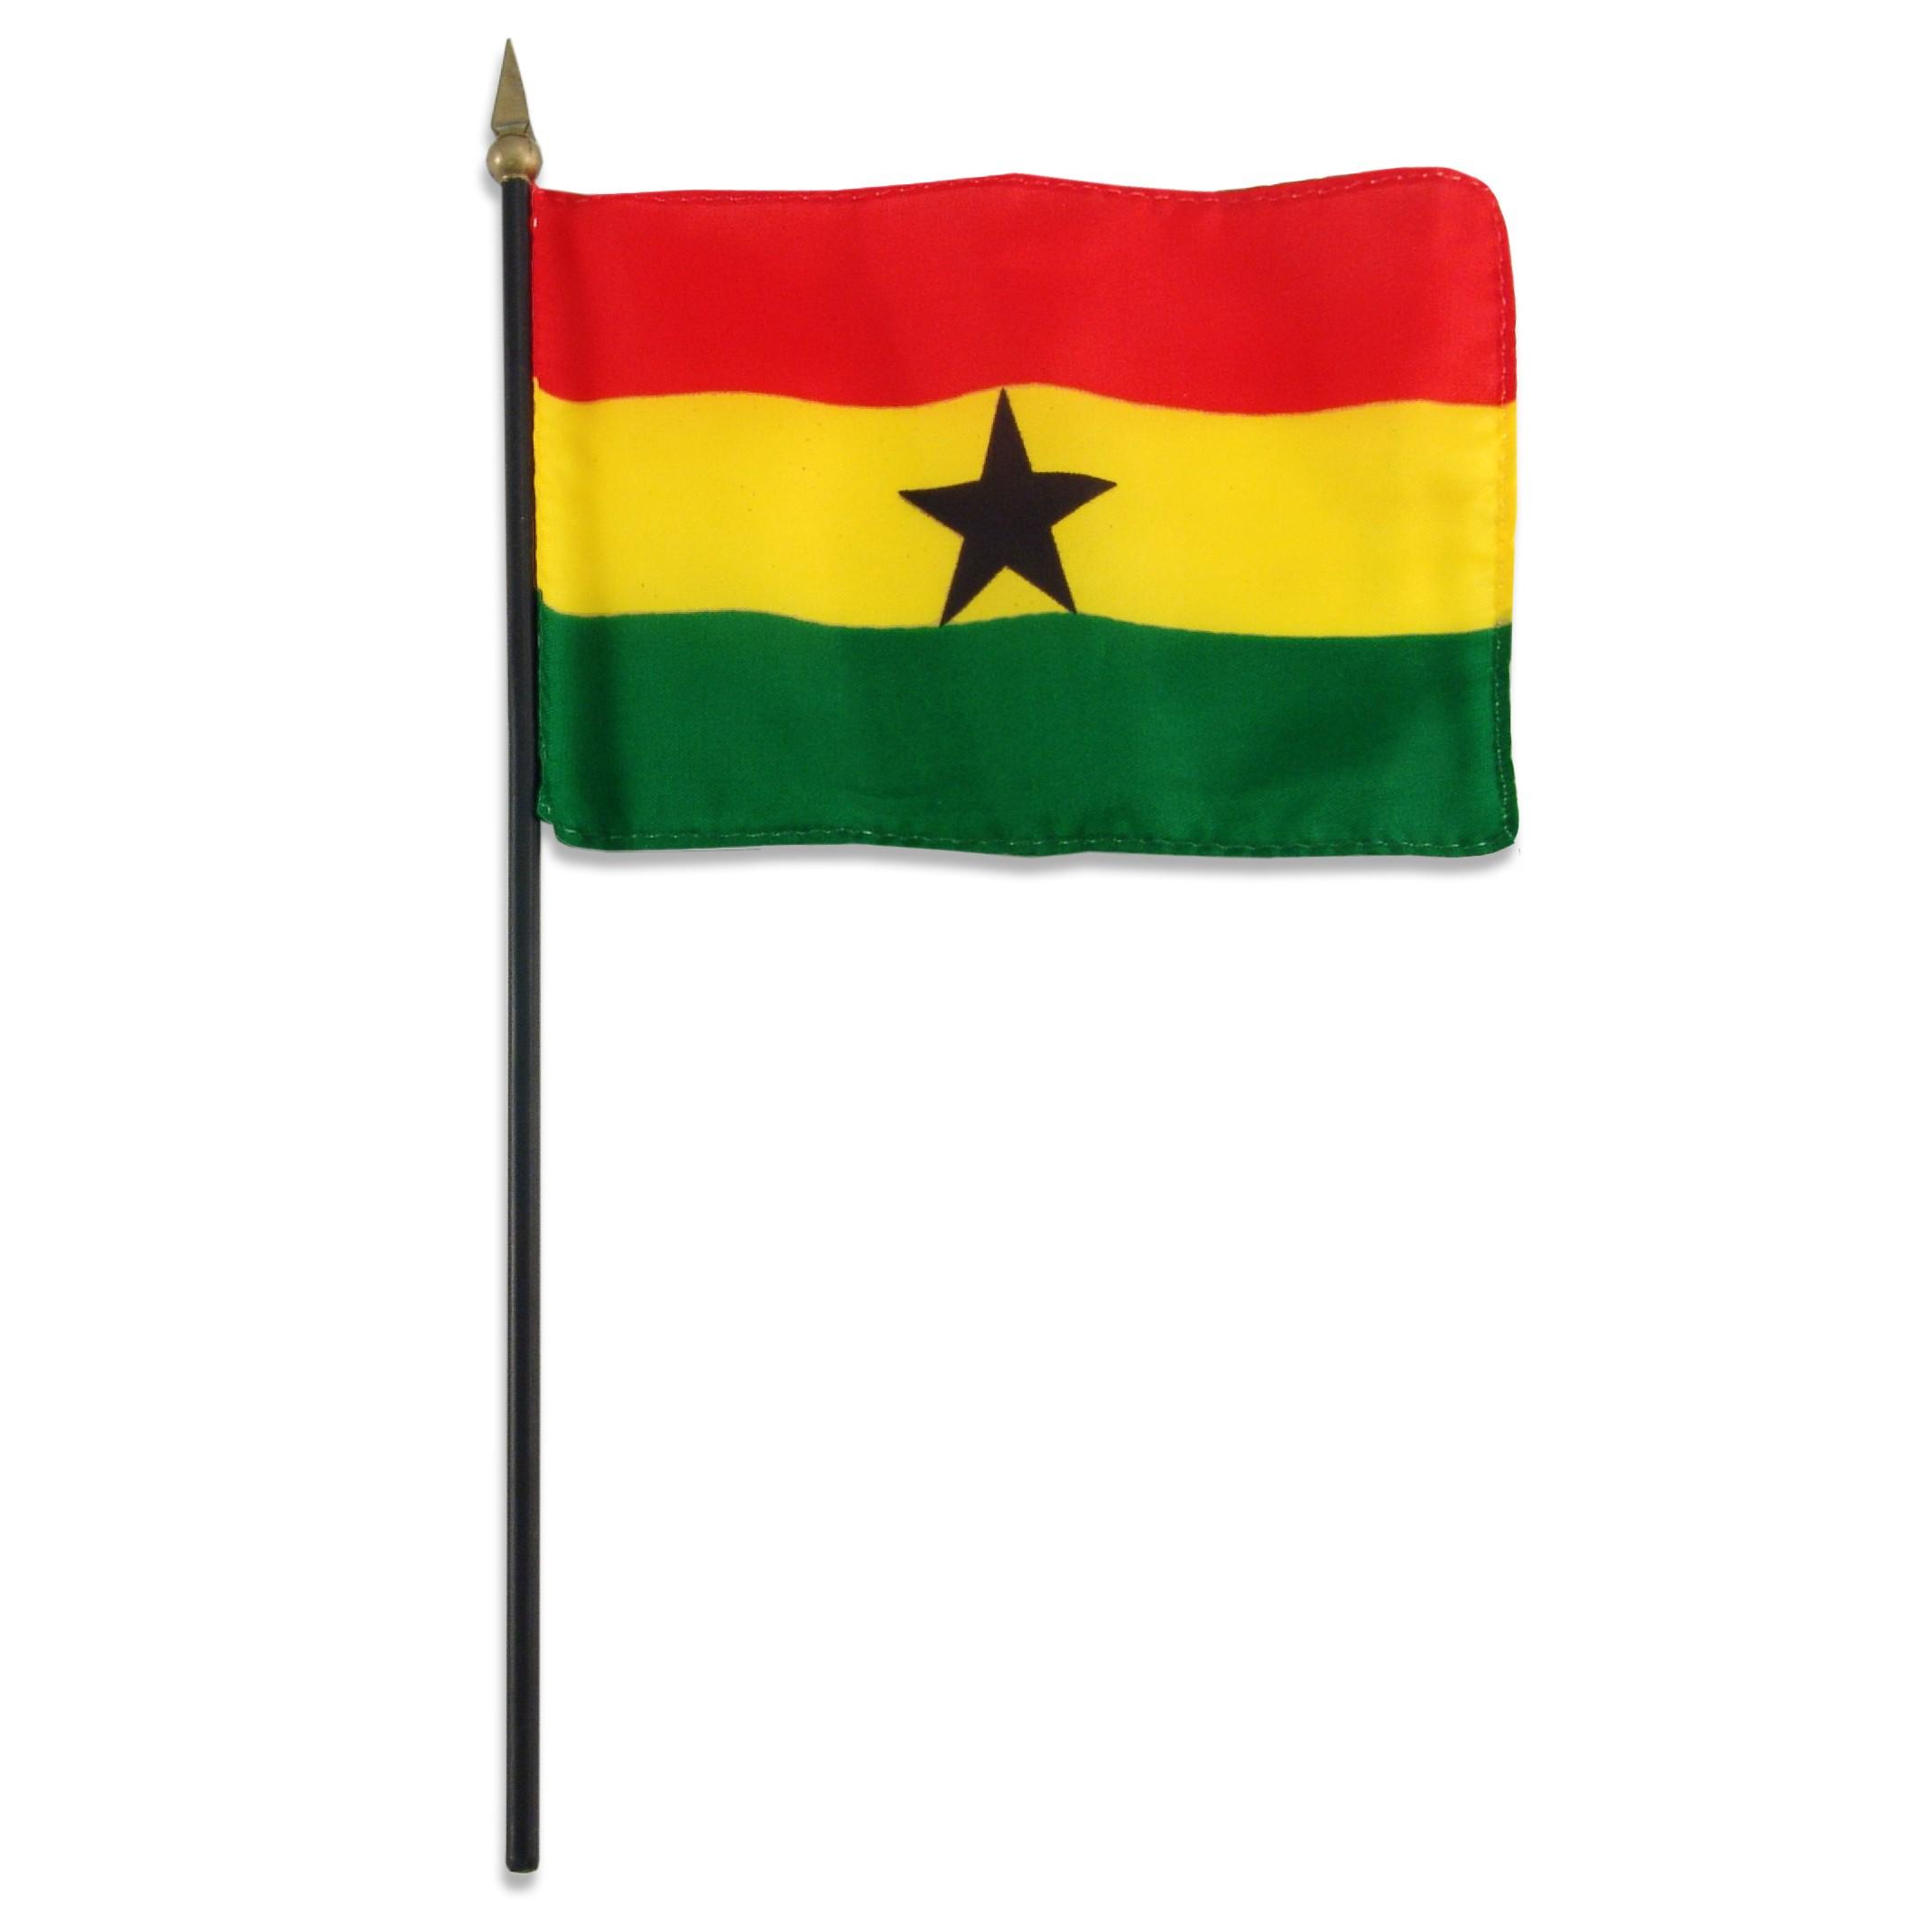 Flag Of Ghana Backgrounds on Wallpapers Vista